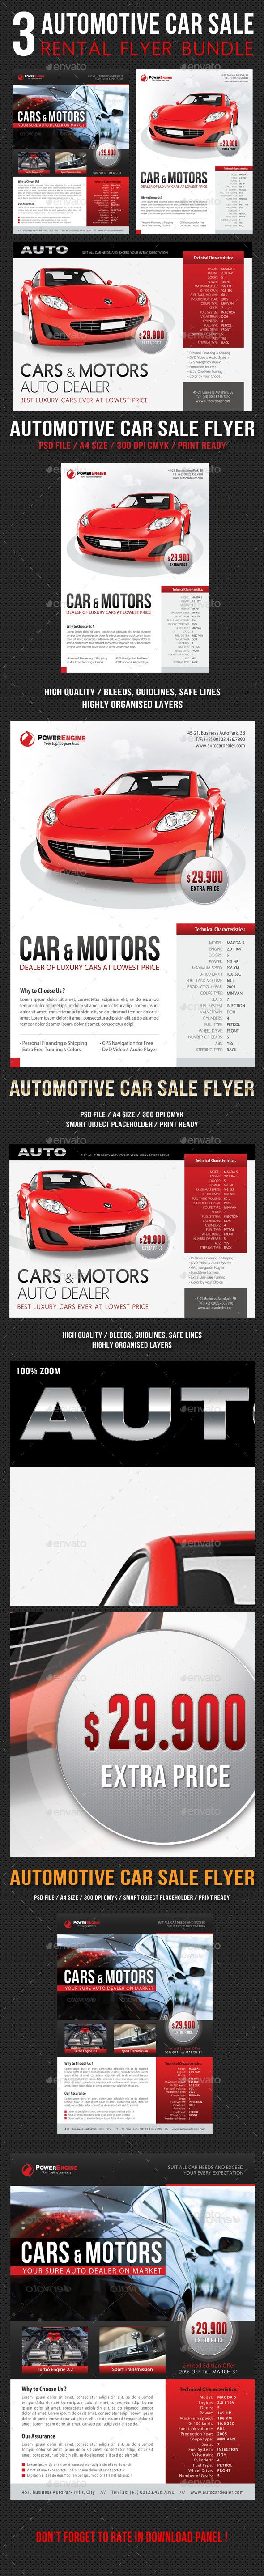 3 in 1 automotive car sale rental flyer bundle by rapidgraf